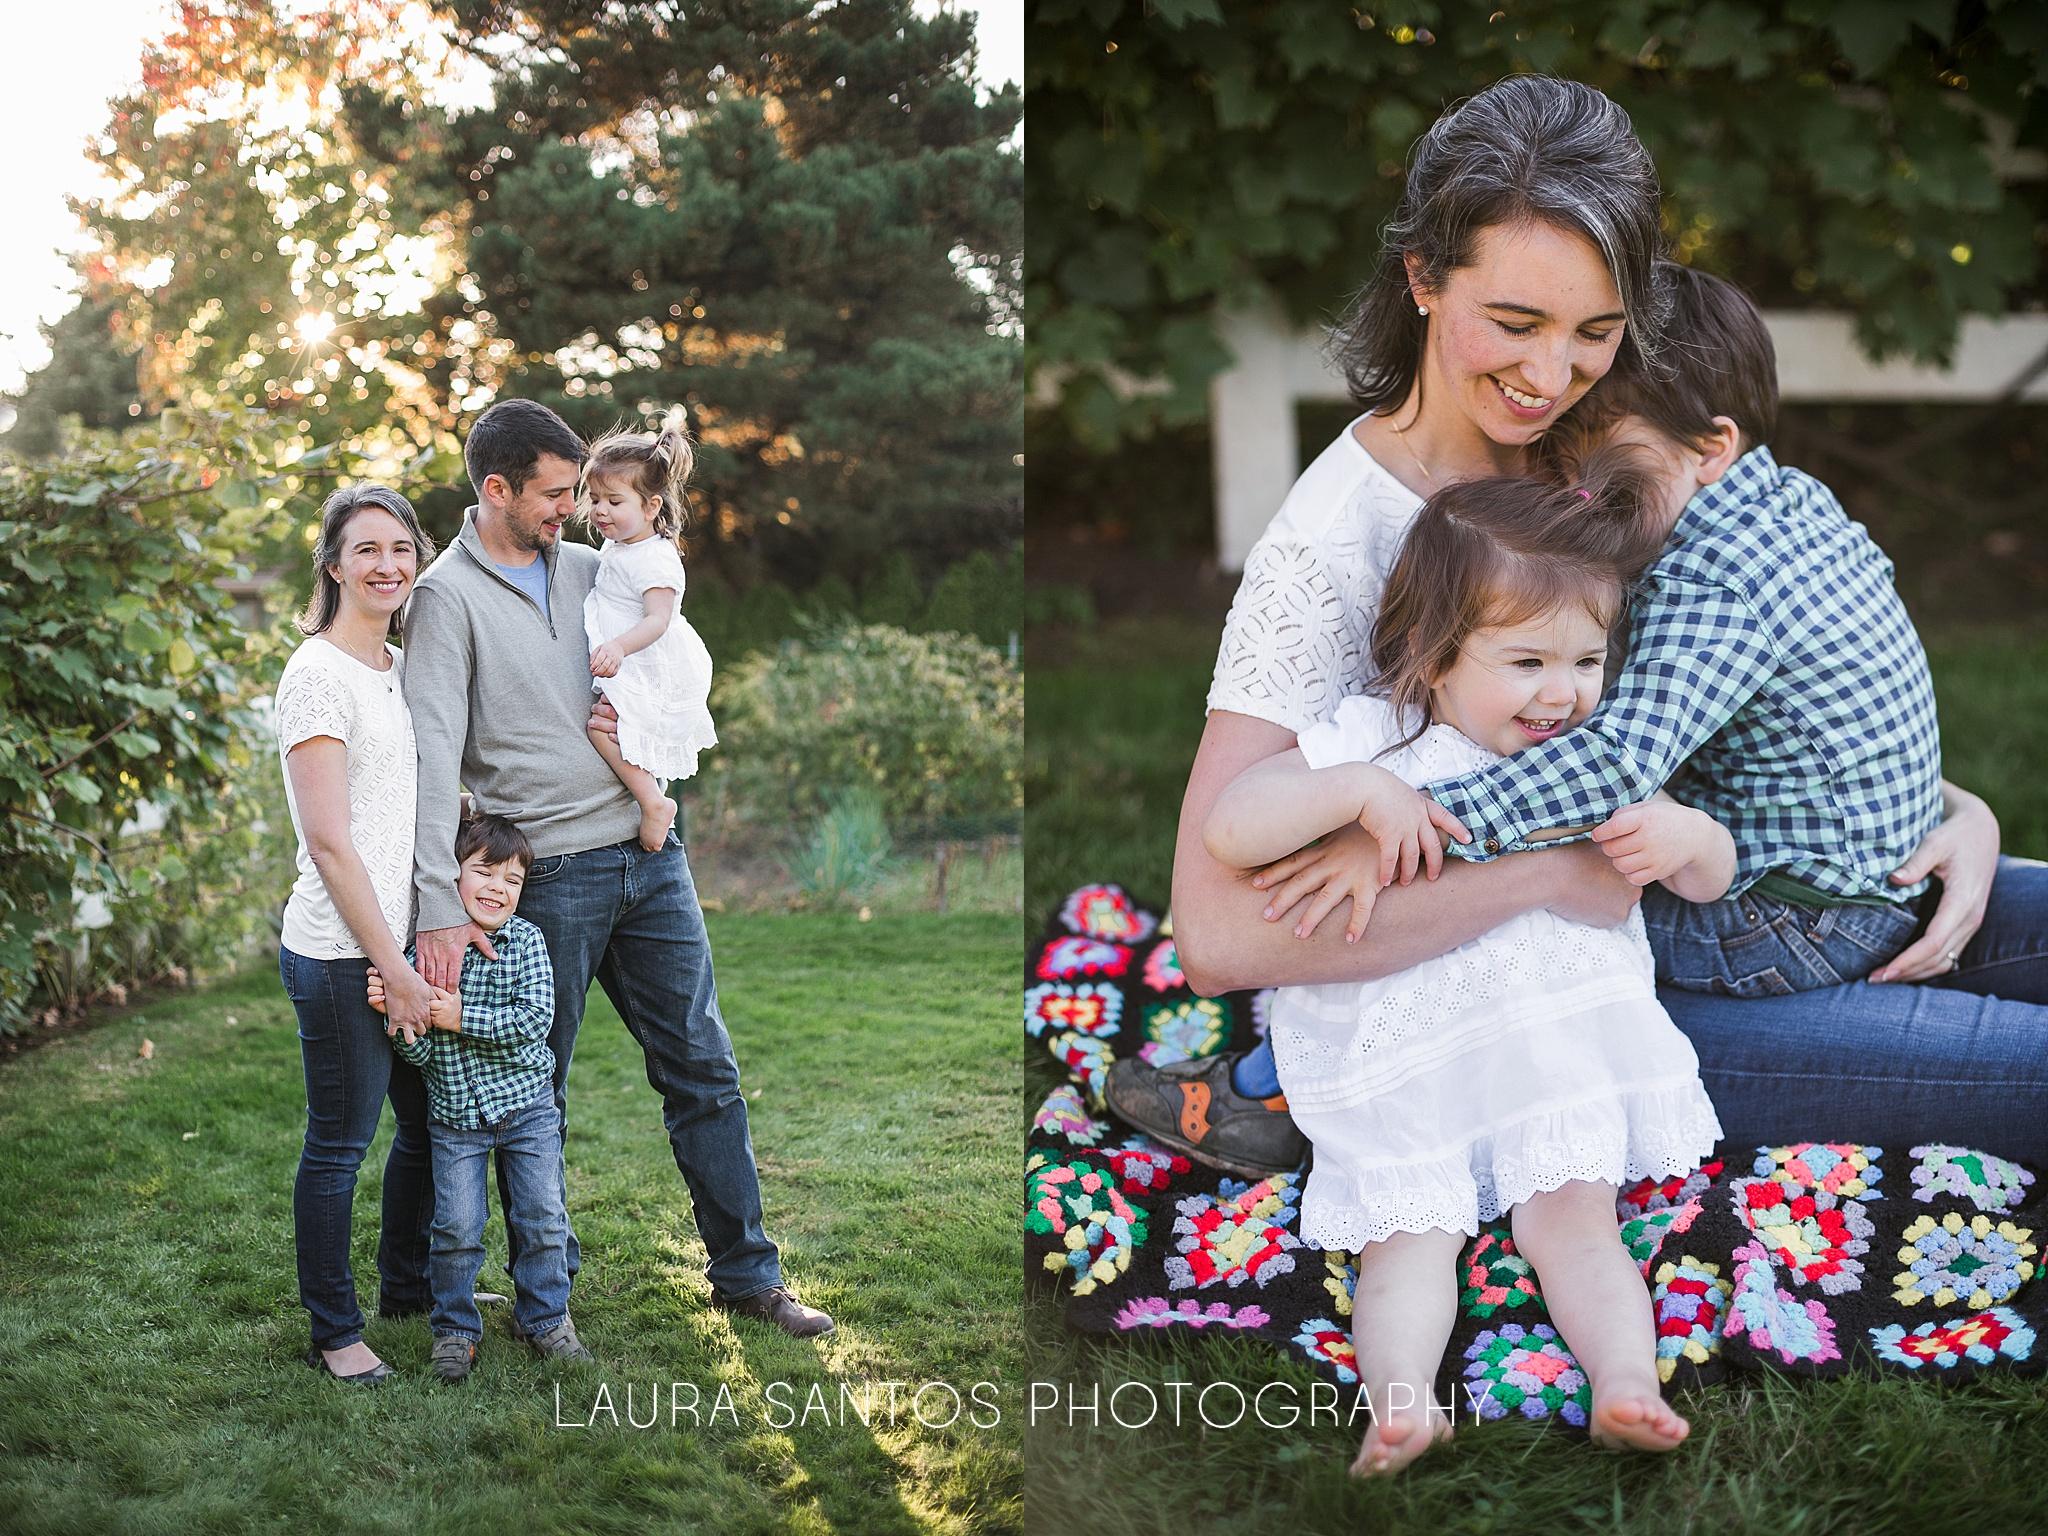 Laura Santos Photography Portland Oregon Family Photographer_0841.jpg